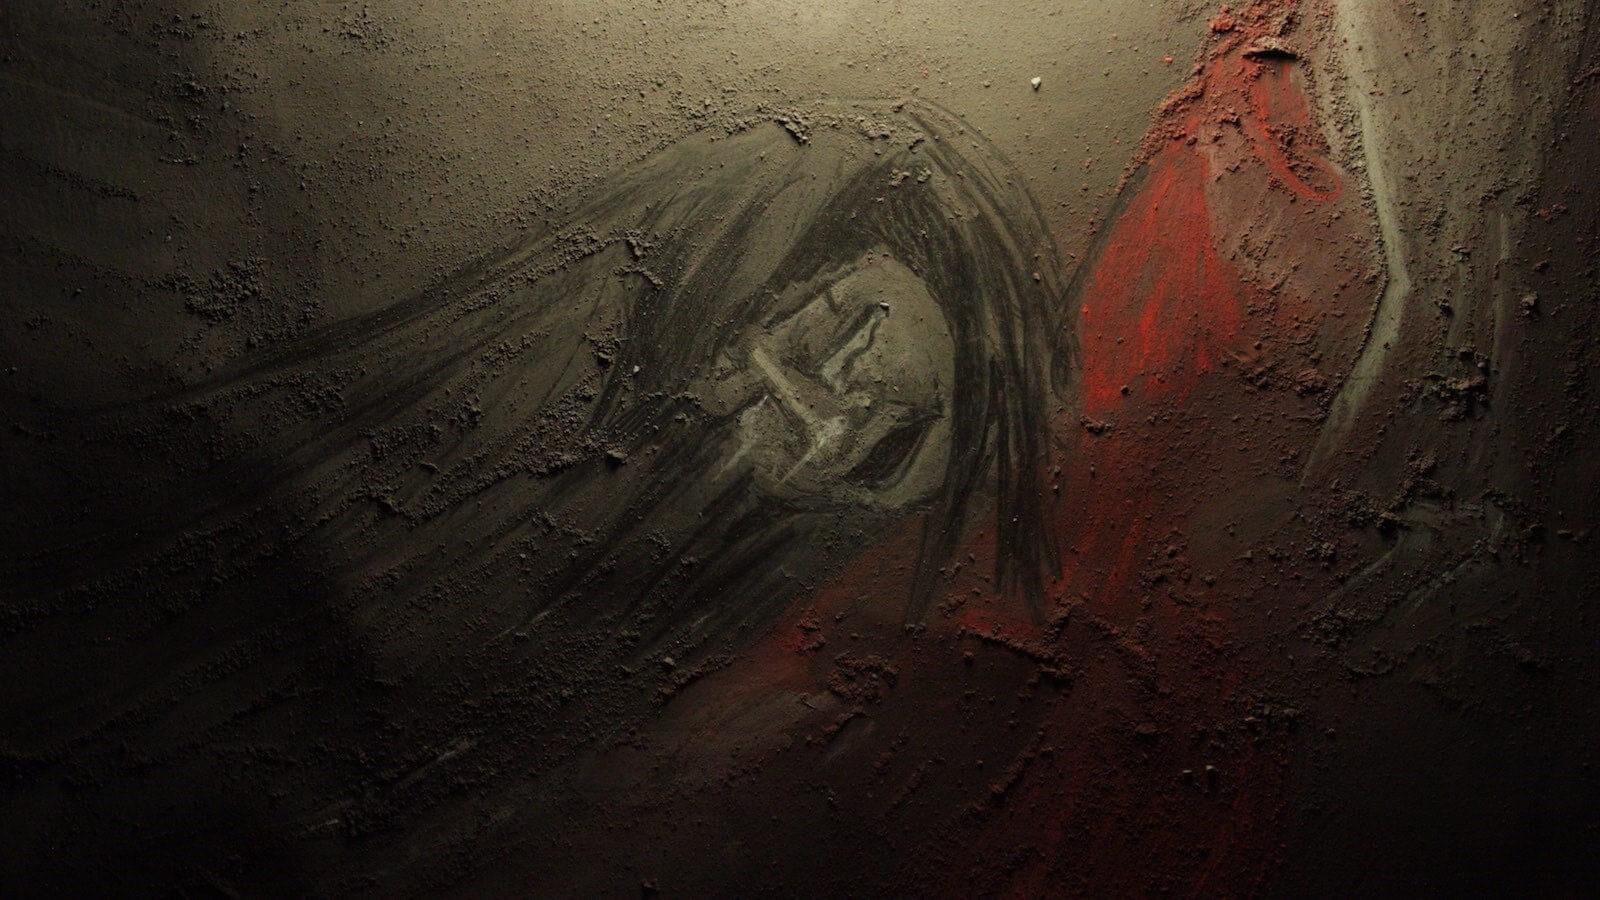 Image Still from Short Film 'Girl in the Hallway'